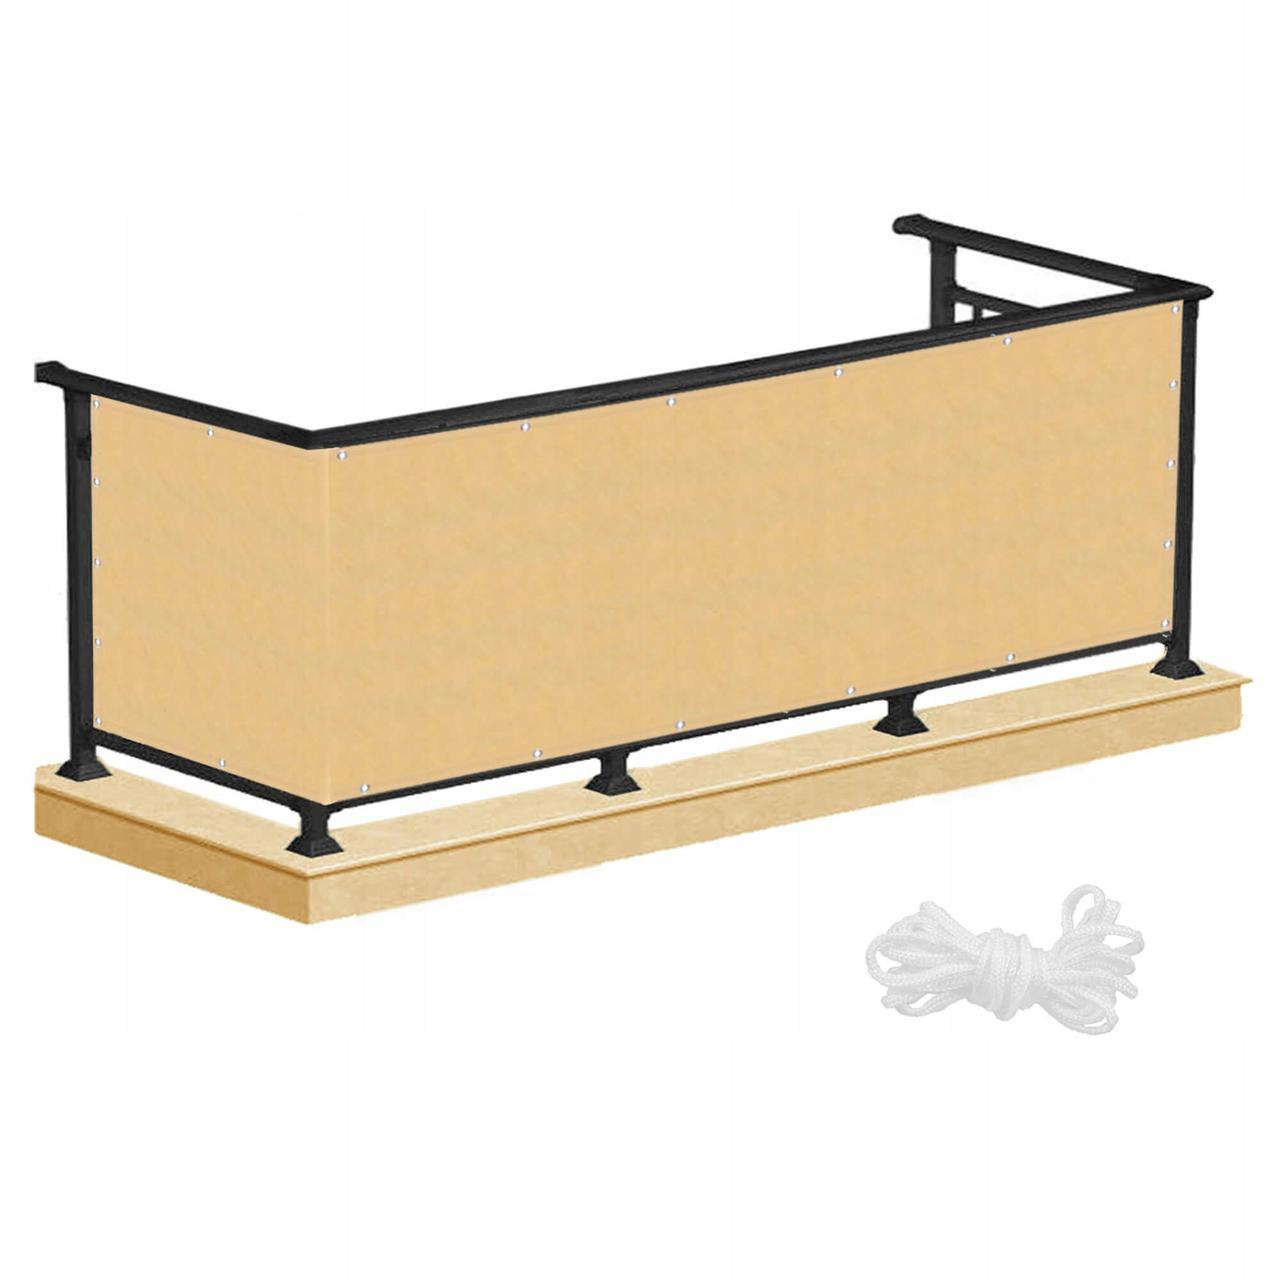 Ширма для балкона (балконный занавес) Springos 0.9 x 5 м BN1013 Бежева